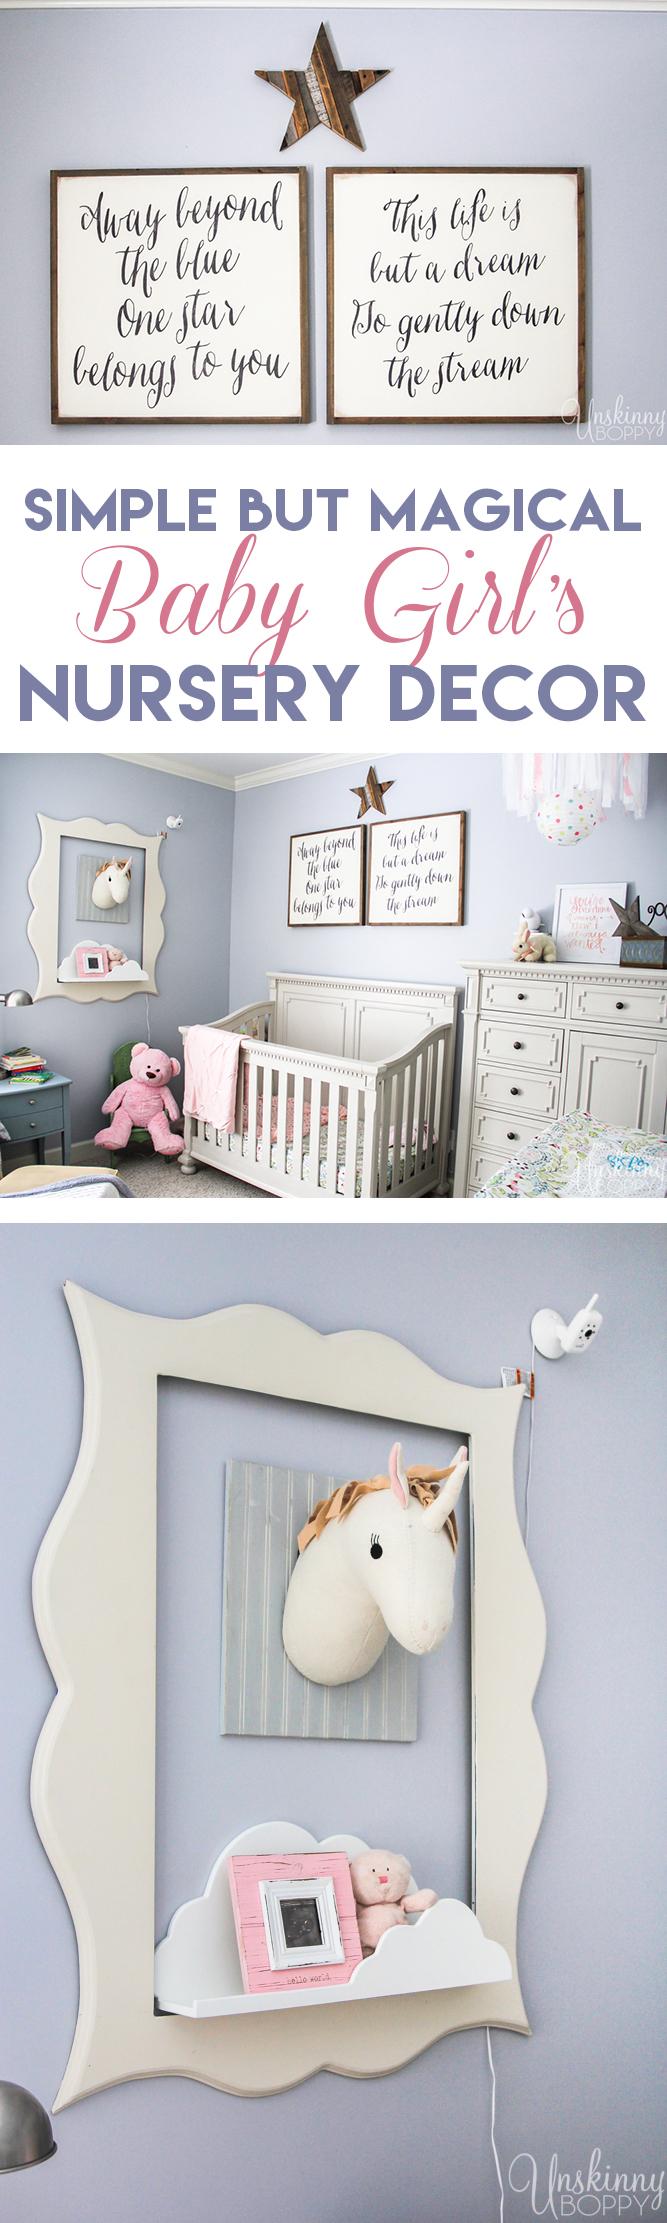 ... Carolineu0027s Nursery, ...